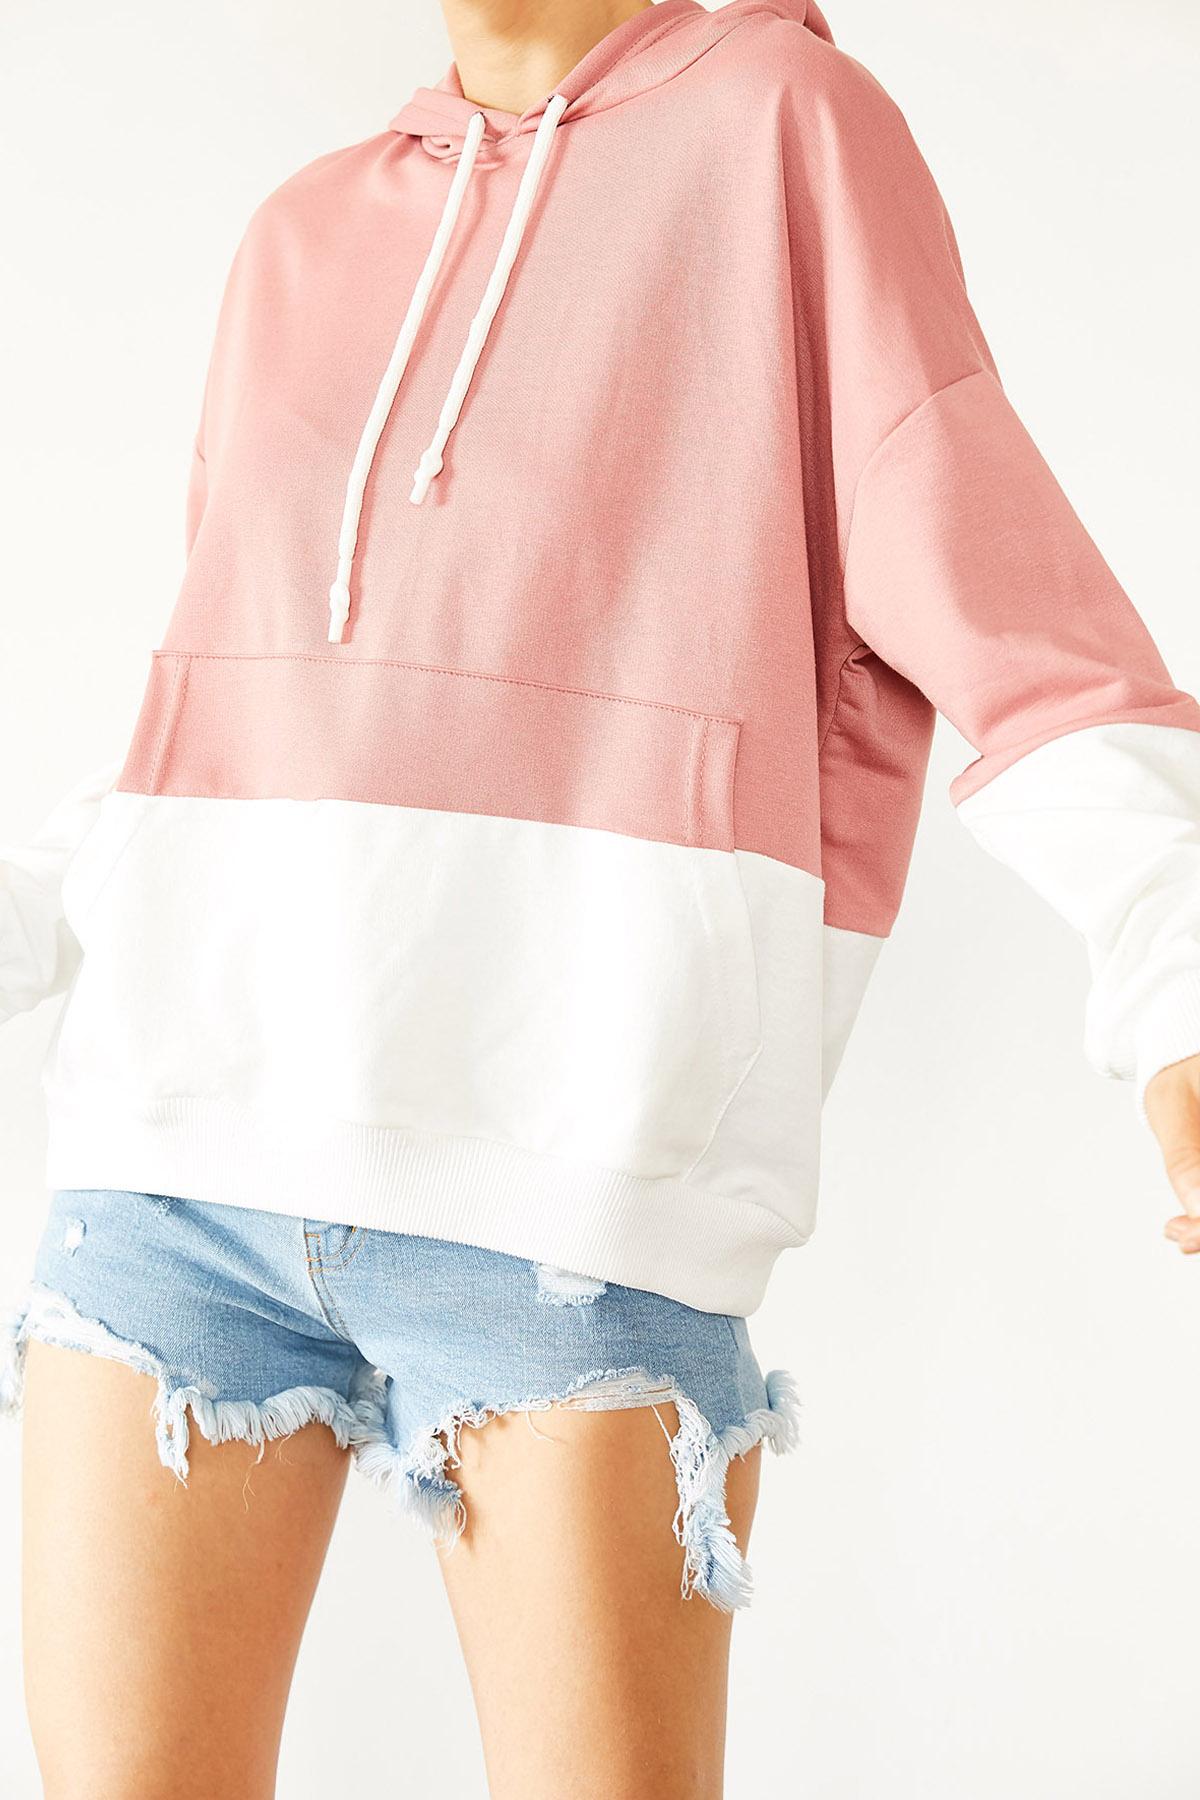 XHAN - Pudra & Beyaz Parçalı Sweatshirt 1KXK8-44526-50